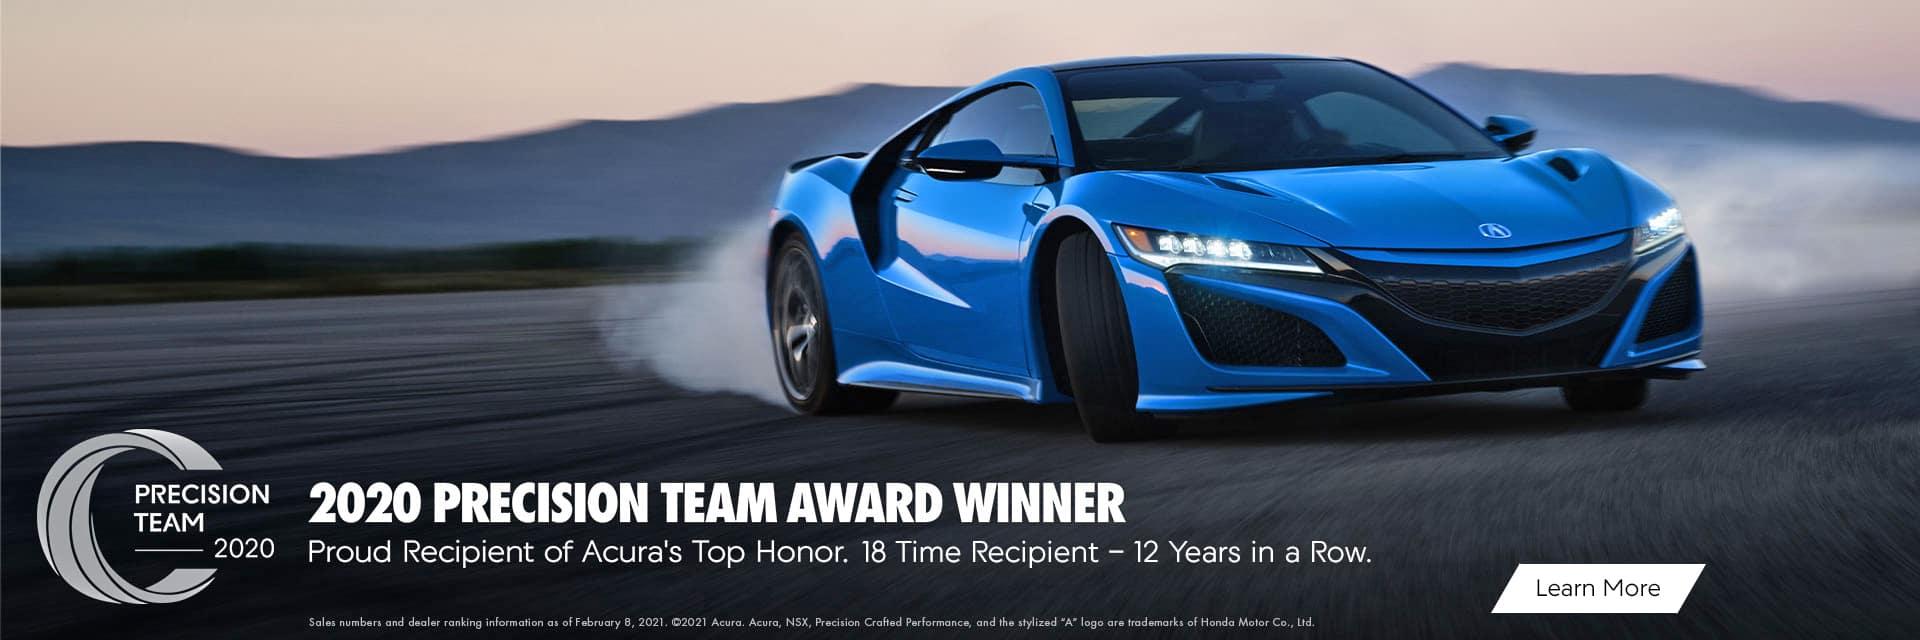 Acura Precision Team Award Winner 2020 Sunnyside Acura Nashua NH 03063